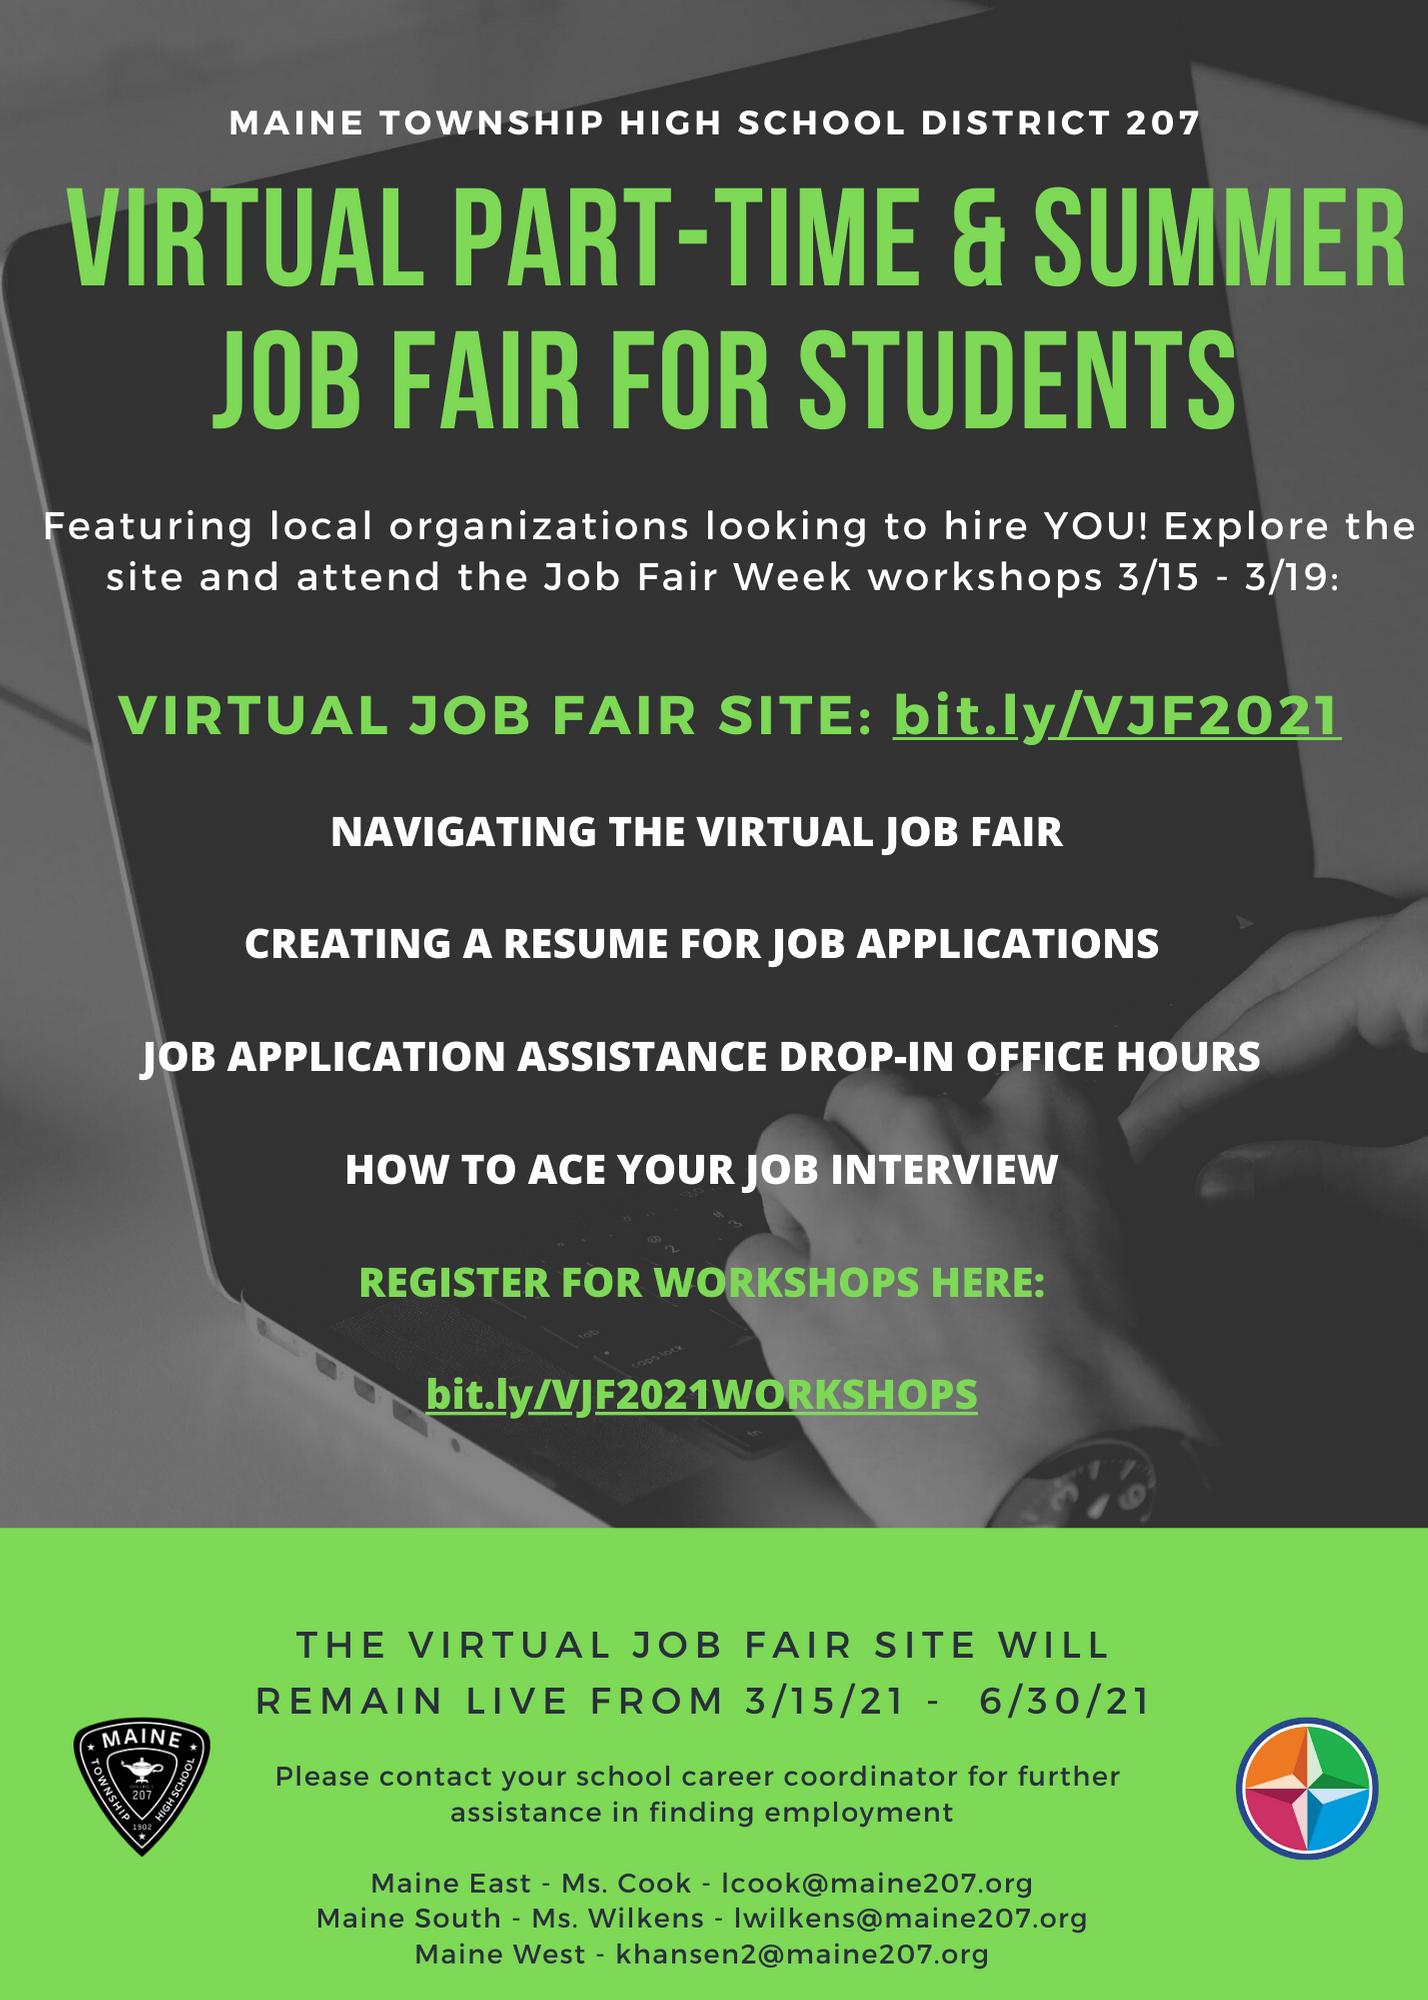 Virtual Job Fair Flyer List of Workshops